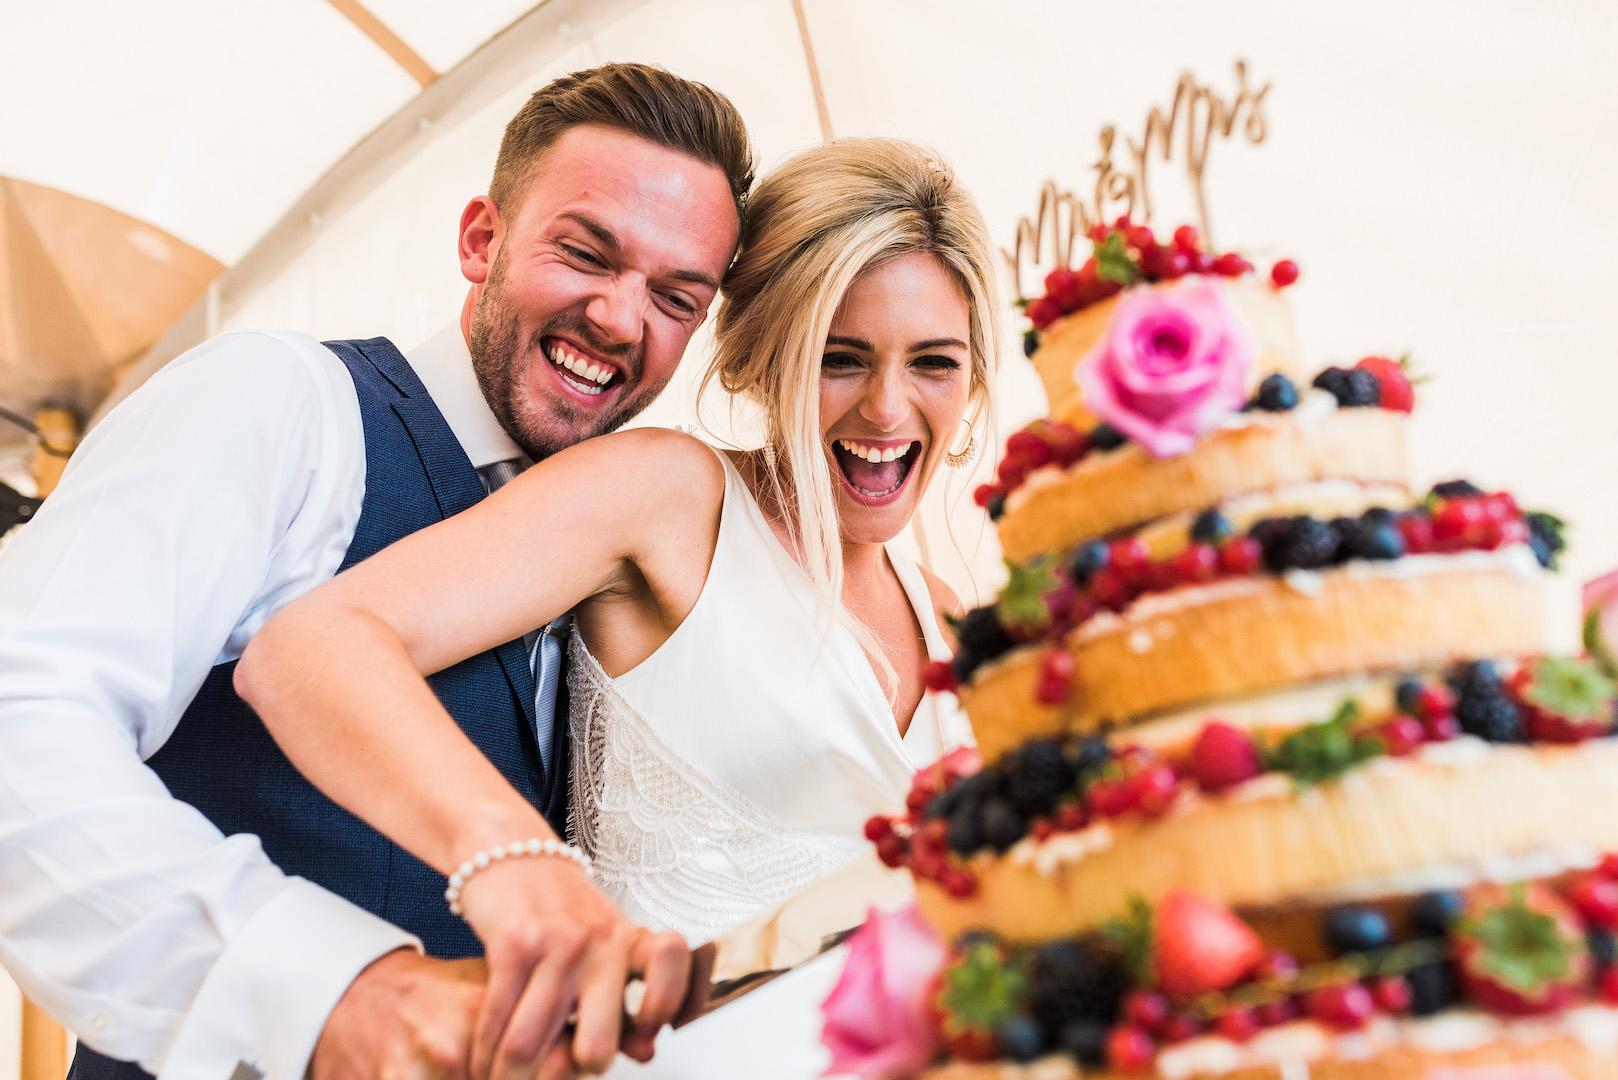 Sarah and Joe's PapaKata Sperry Wedding: Cutting the cake